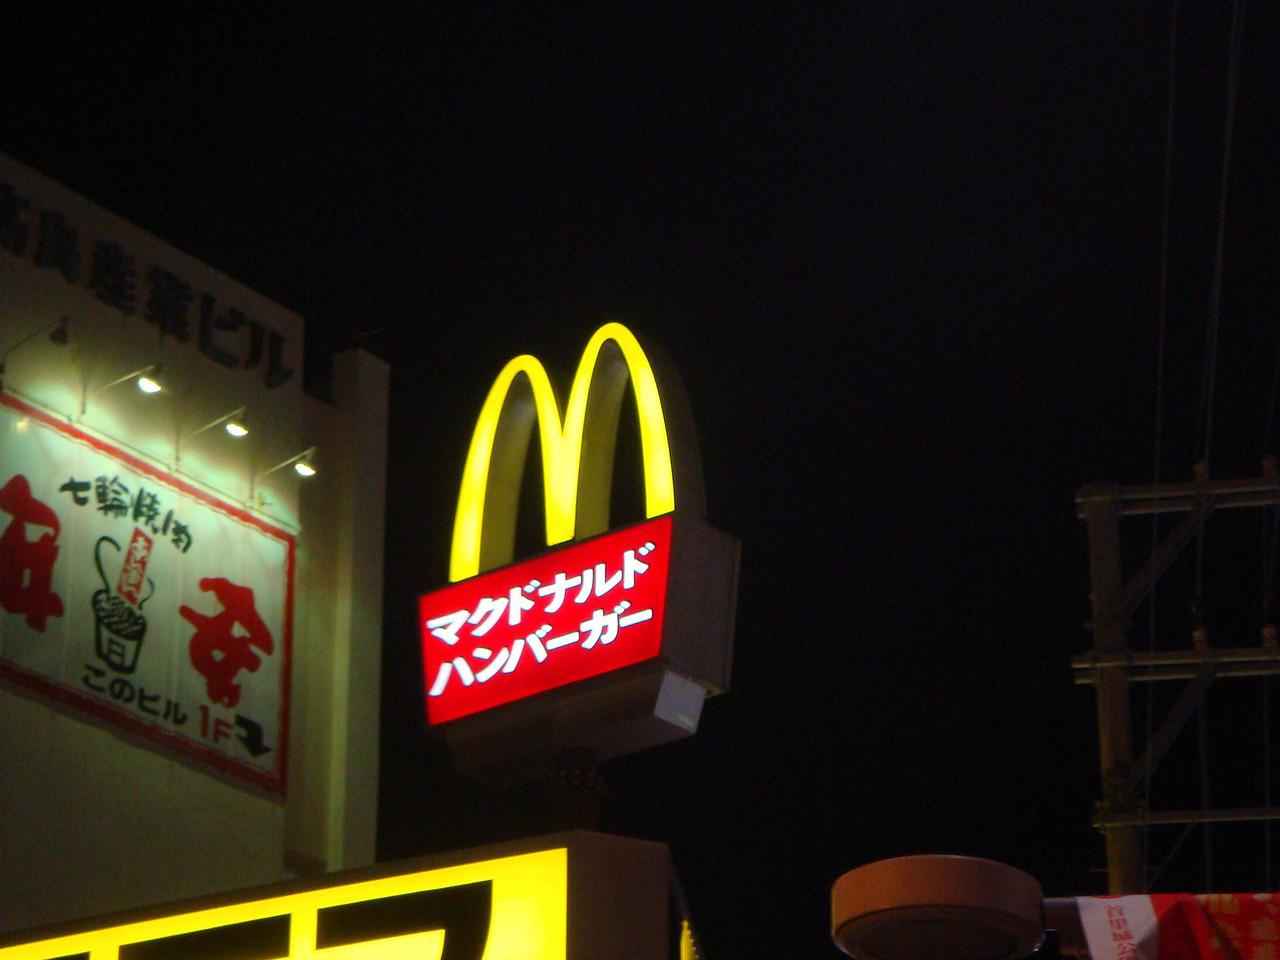 Neon McDonald's Sign in Okinawa, Japan